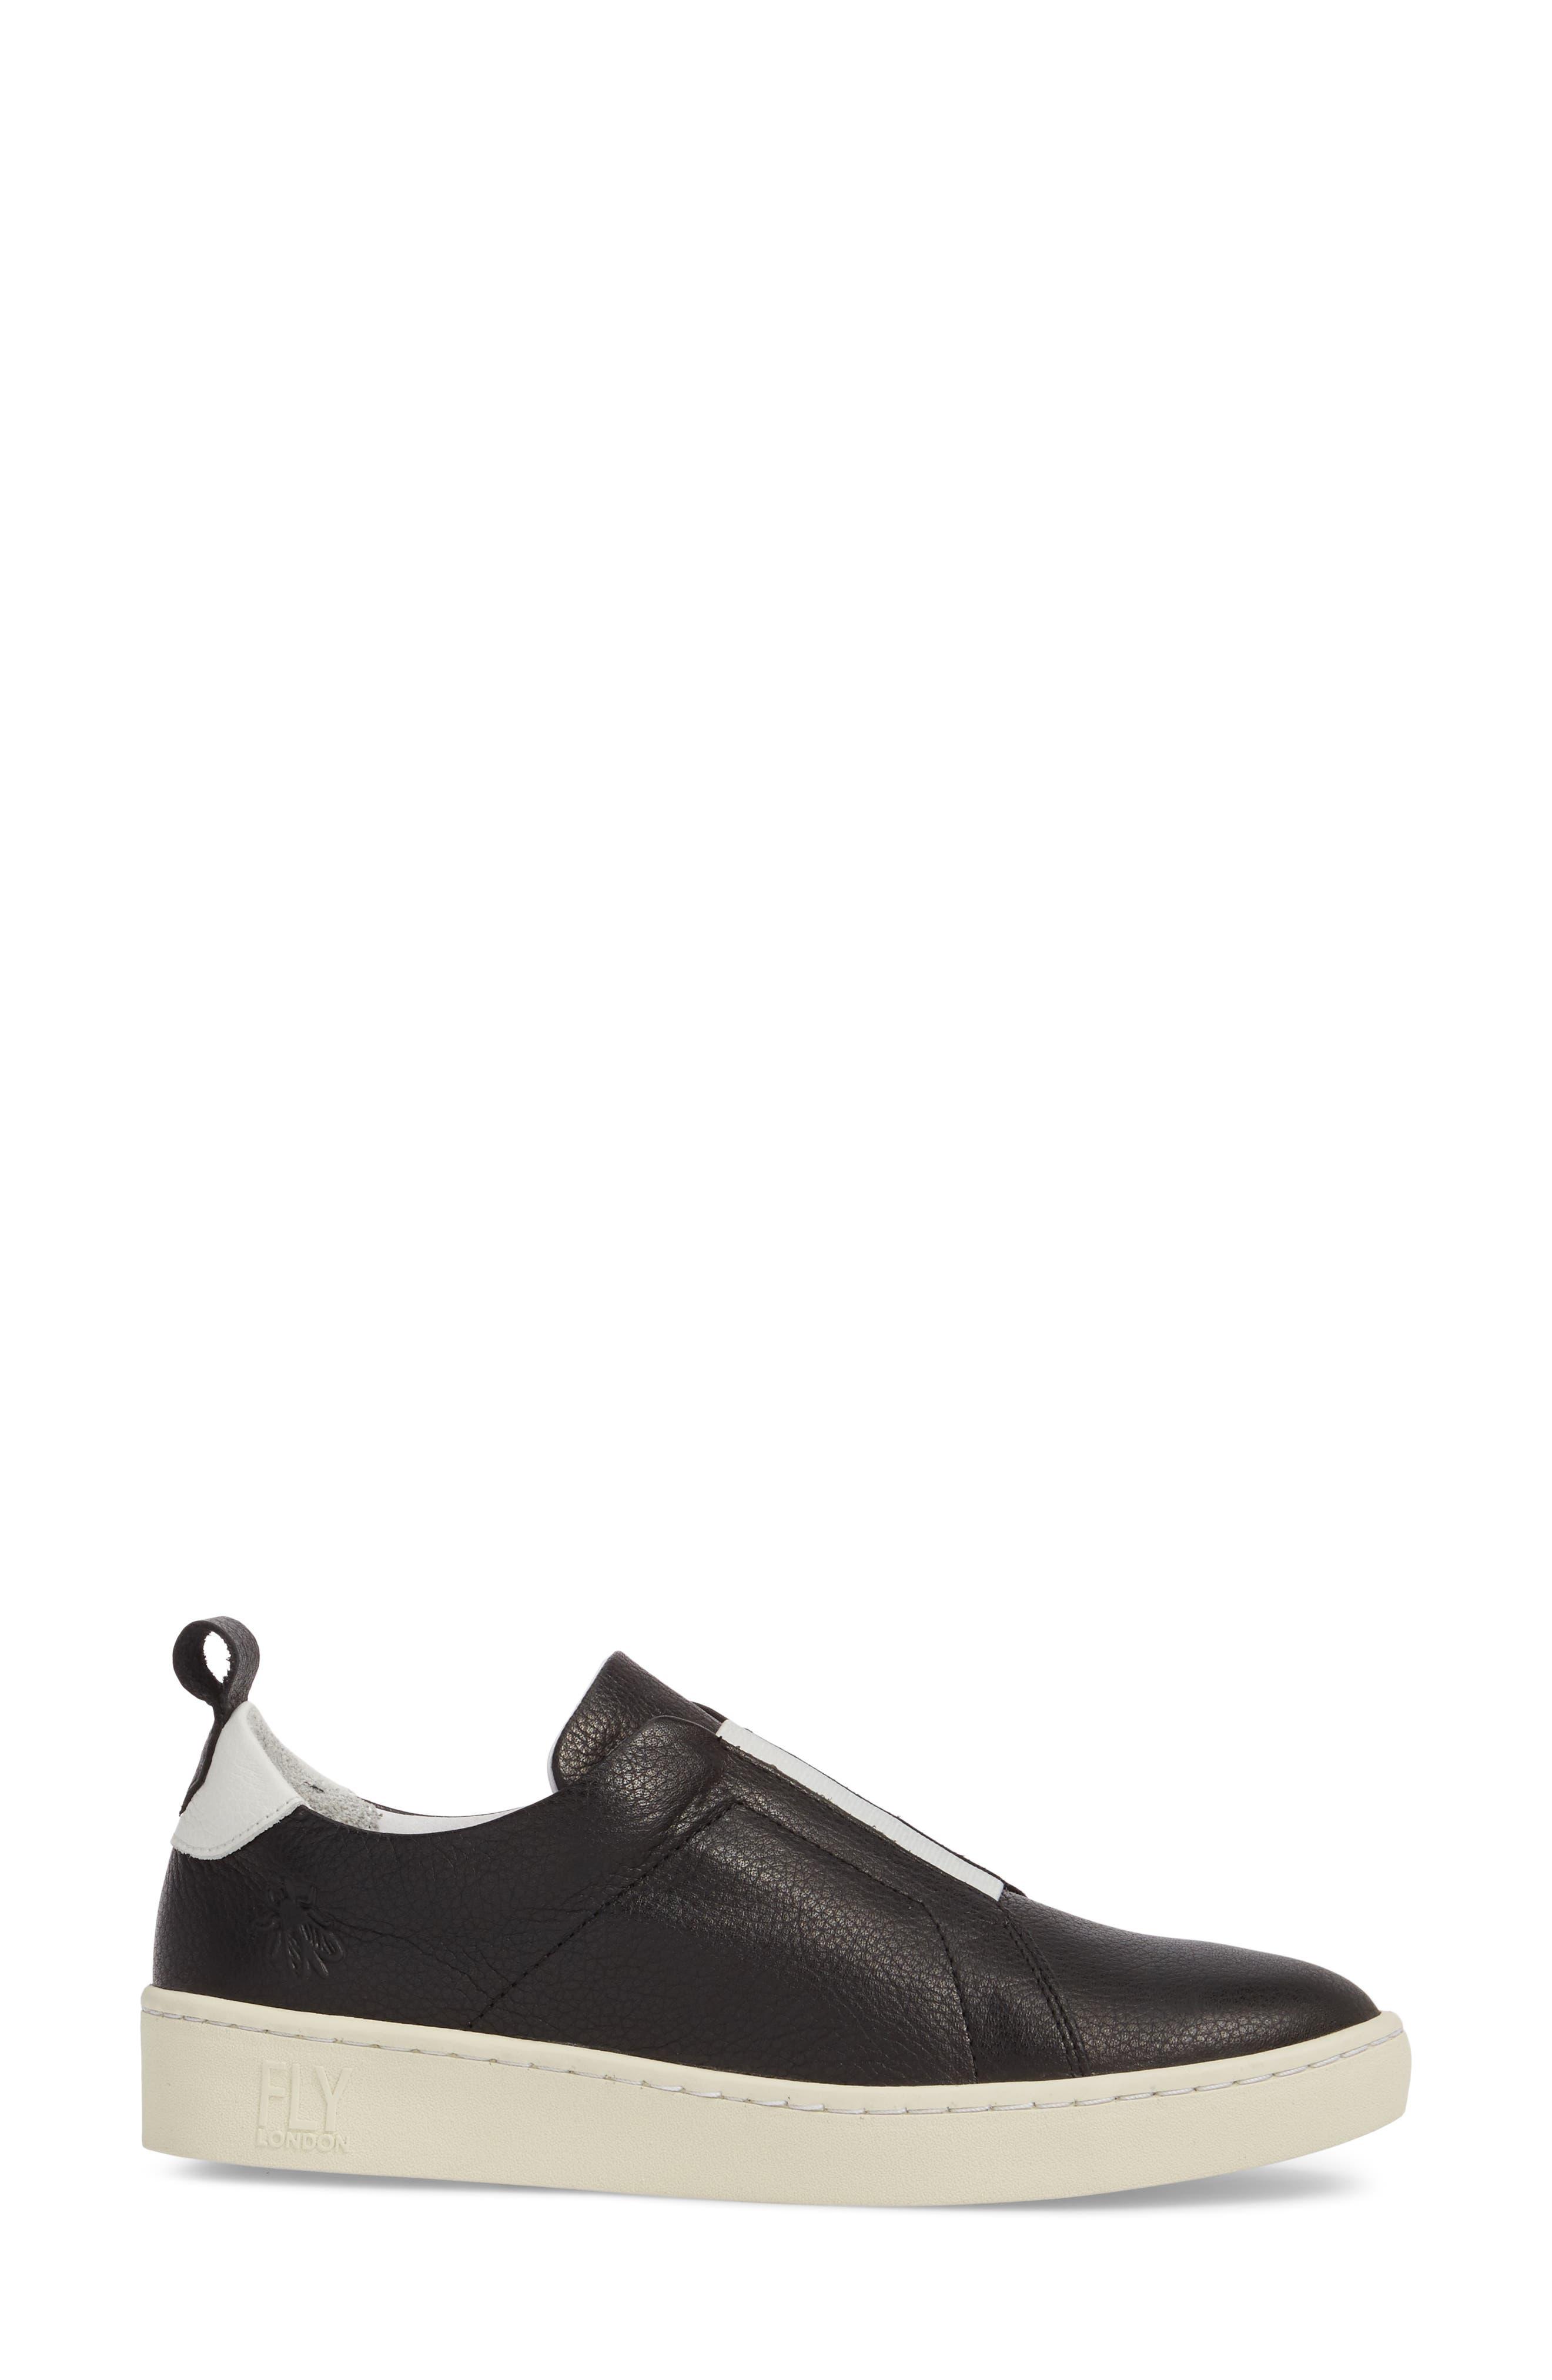 Mutt Slip-On Sneaker,                             Alternate thumbnail 3, color,                             BLACK BRITO LEATHER